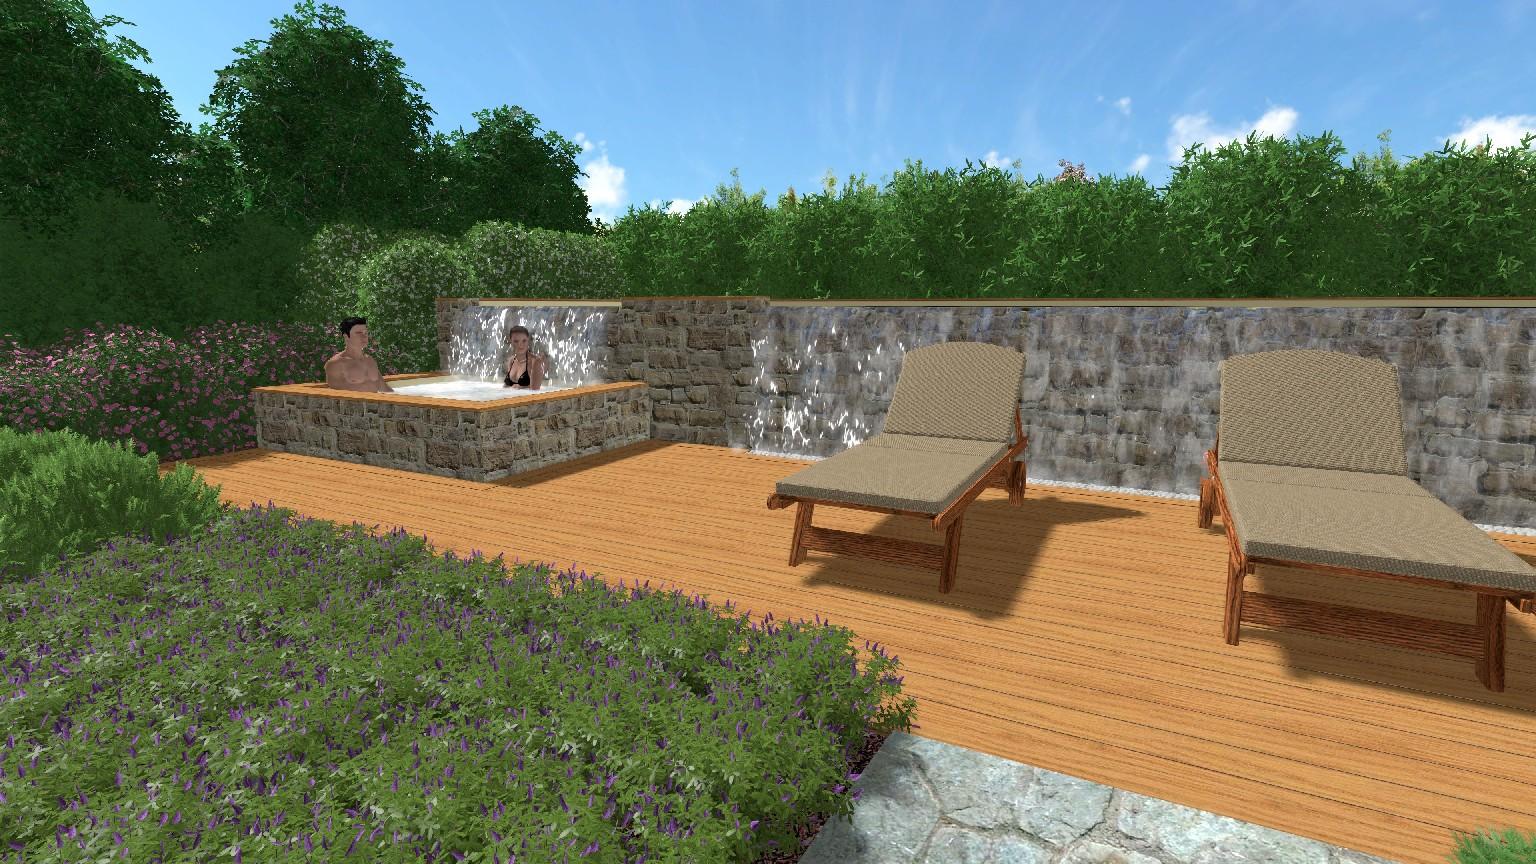 Gallery of davide giorgi paesaggista with giardino con piscina - Giardino con piscina esterna ...